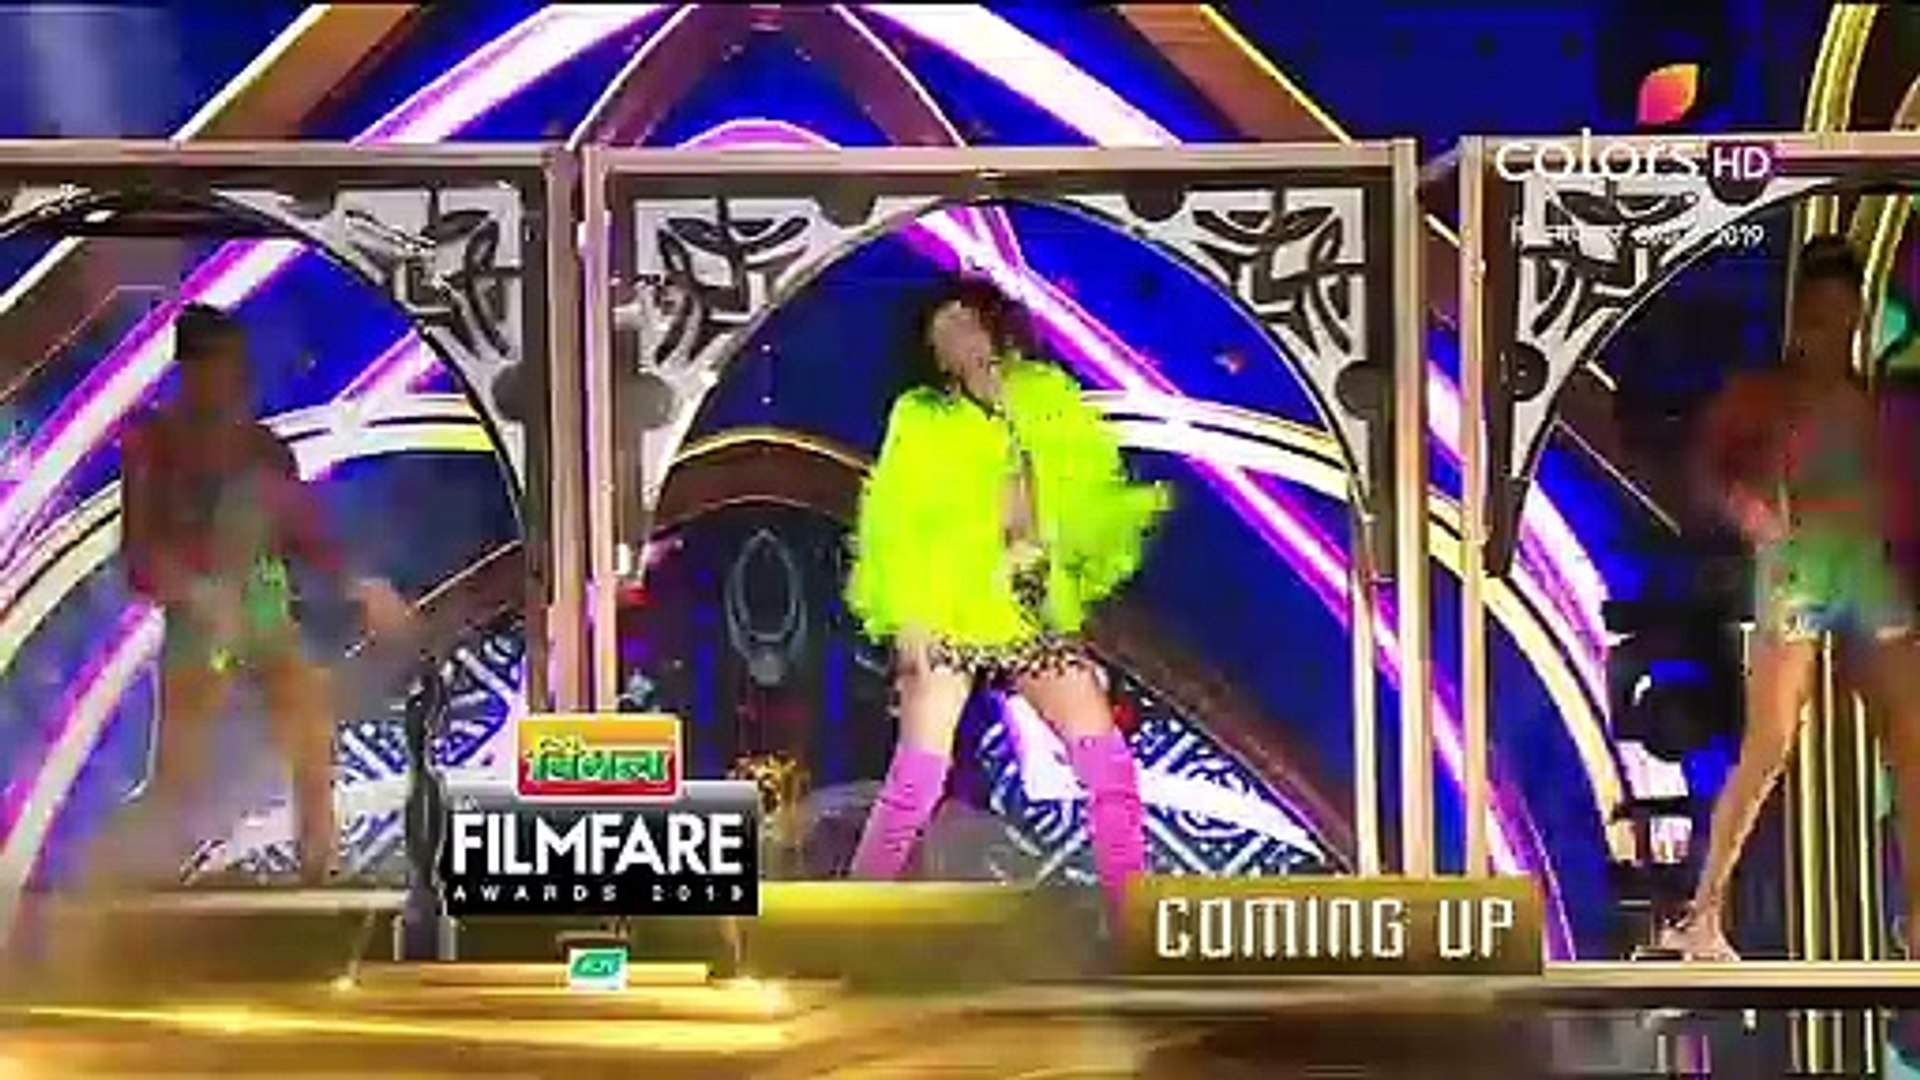 64th Filmfare Awards 2019 Full Show (Part 2) - 20th April 2019